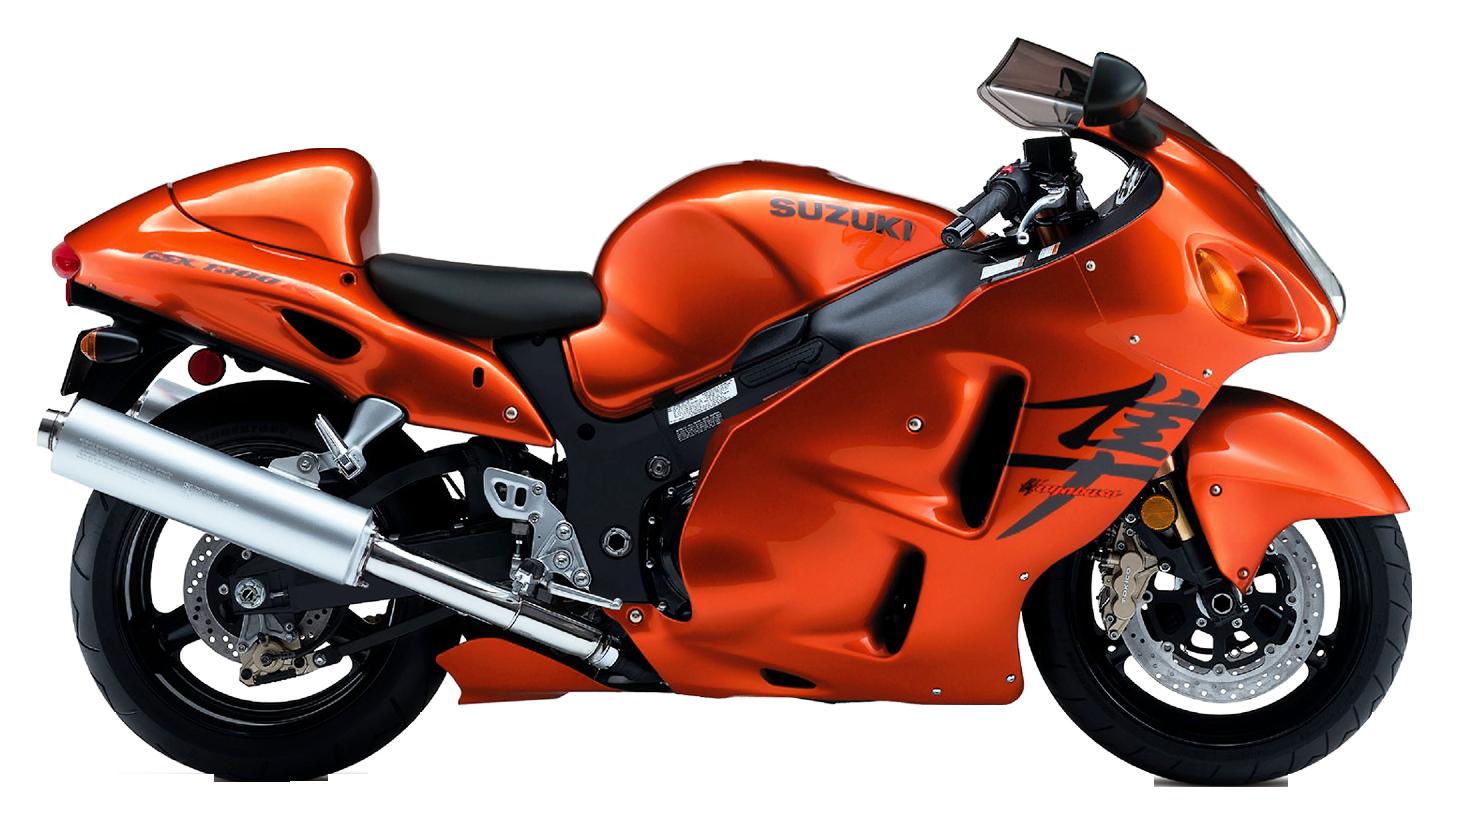 Motorcycle clipart hayabusa. Suzuki png image purepng